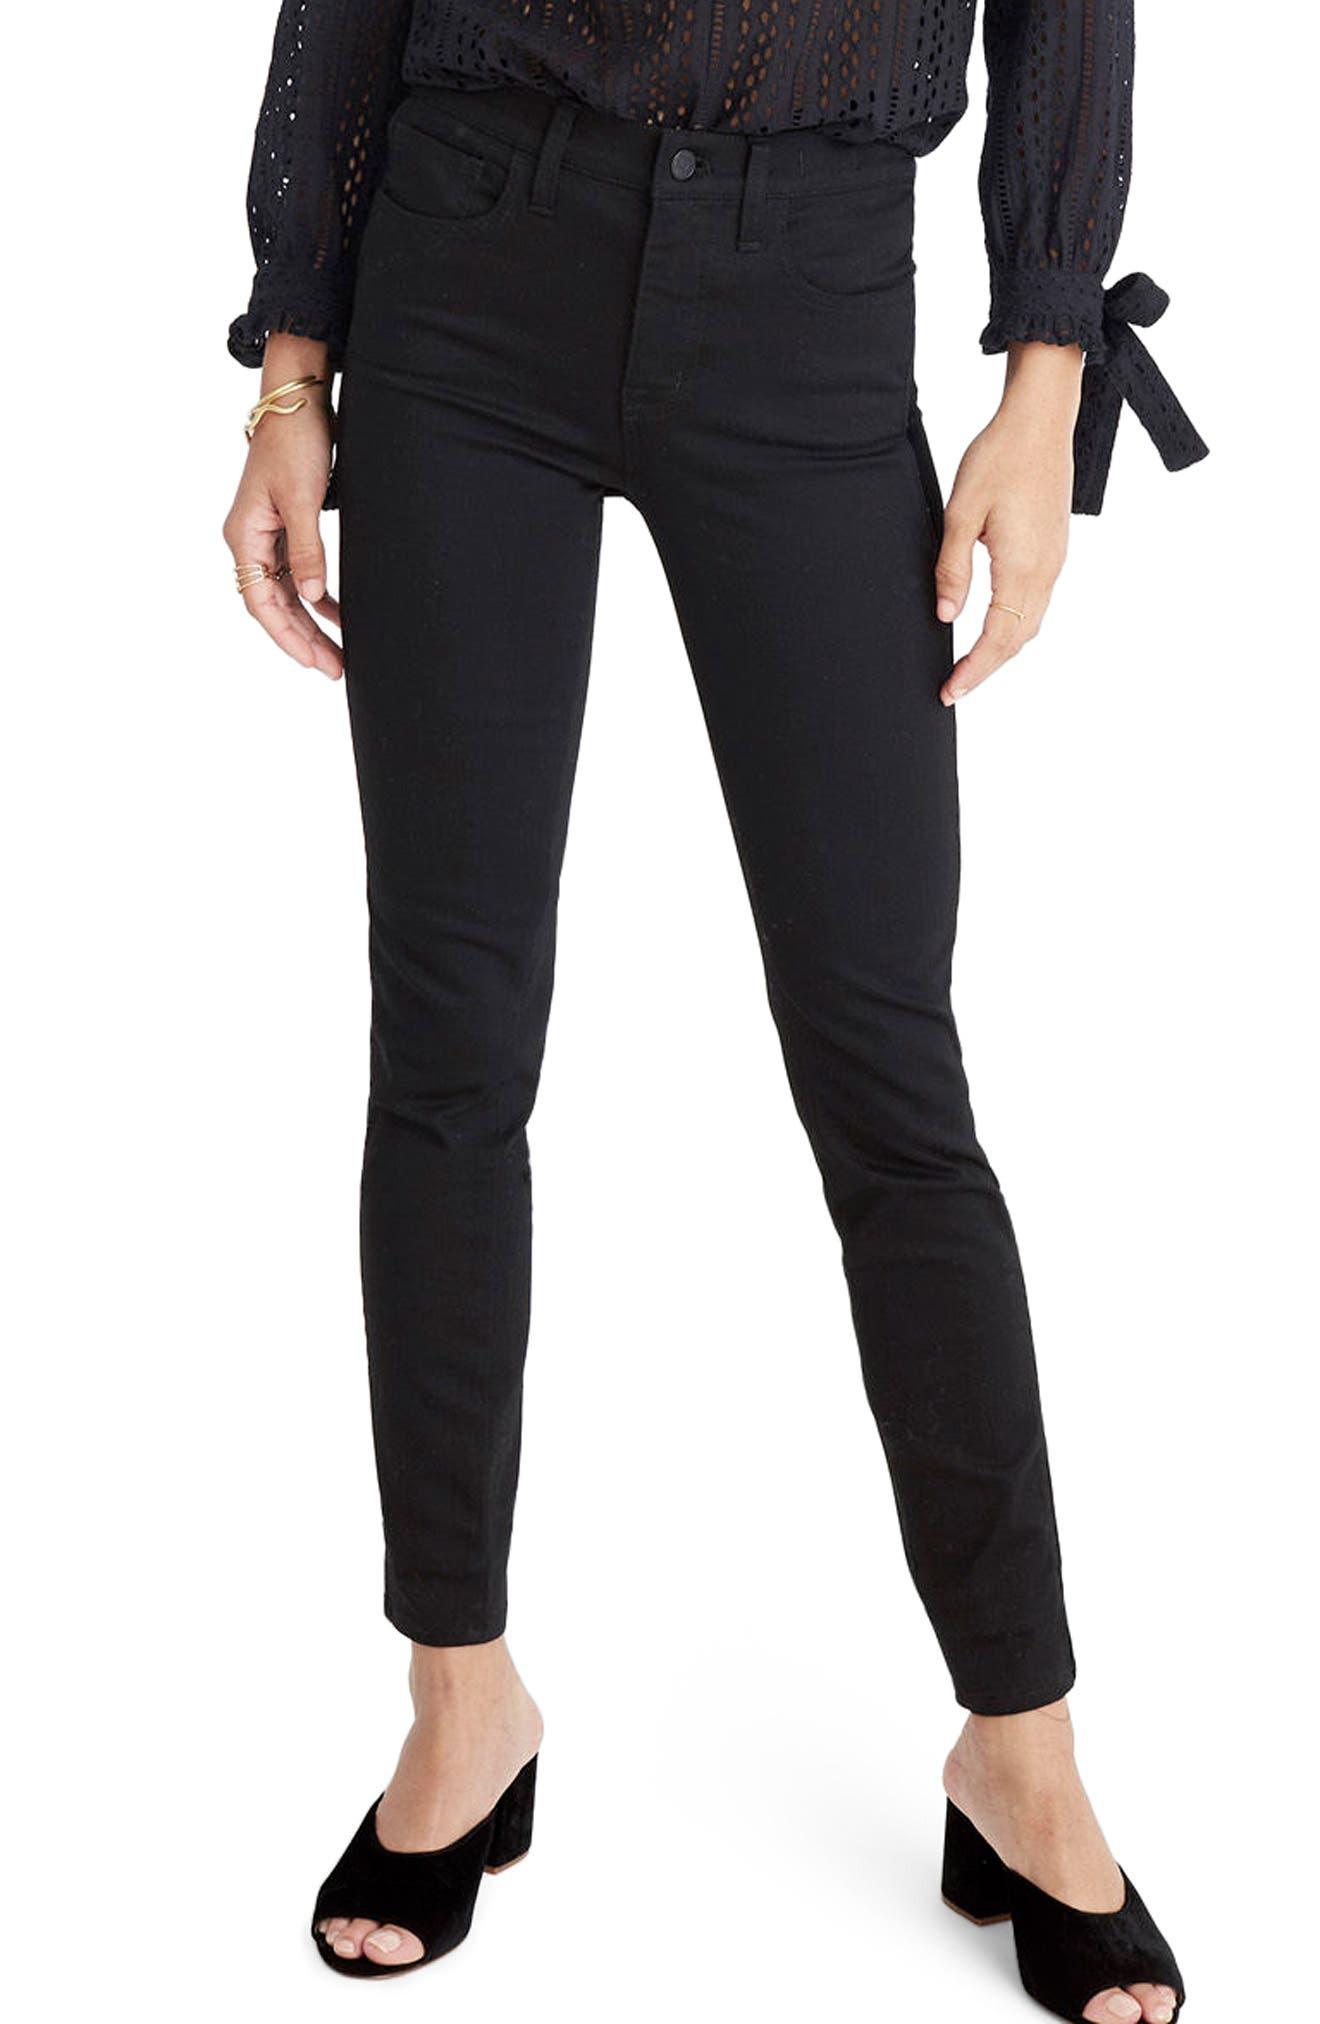 Main Image - Madewell 9-Inch High Waist Tuxedo Stripe Skinny Jeans (Esther)